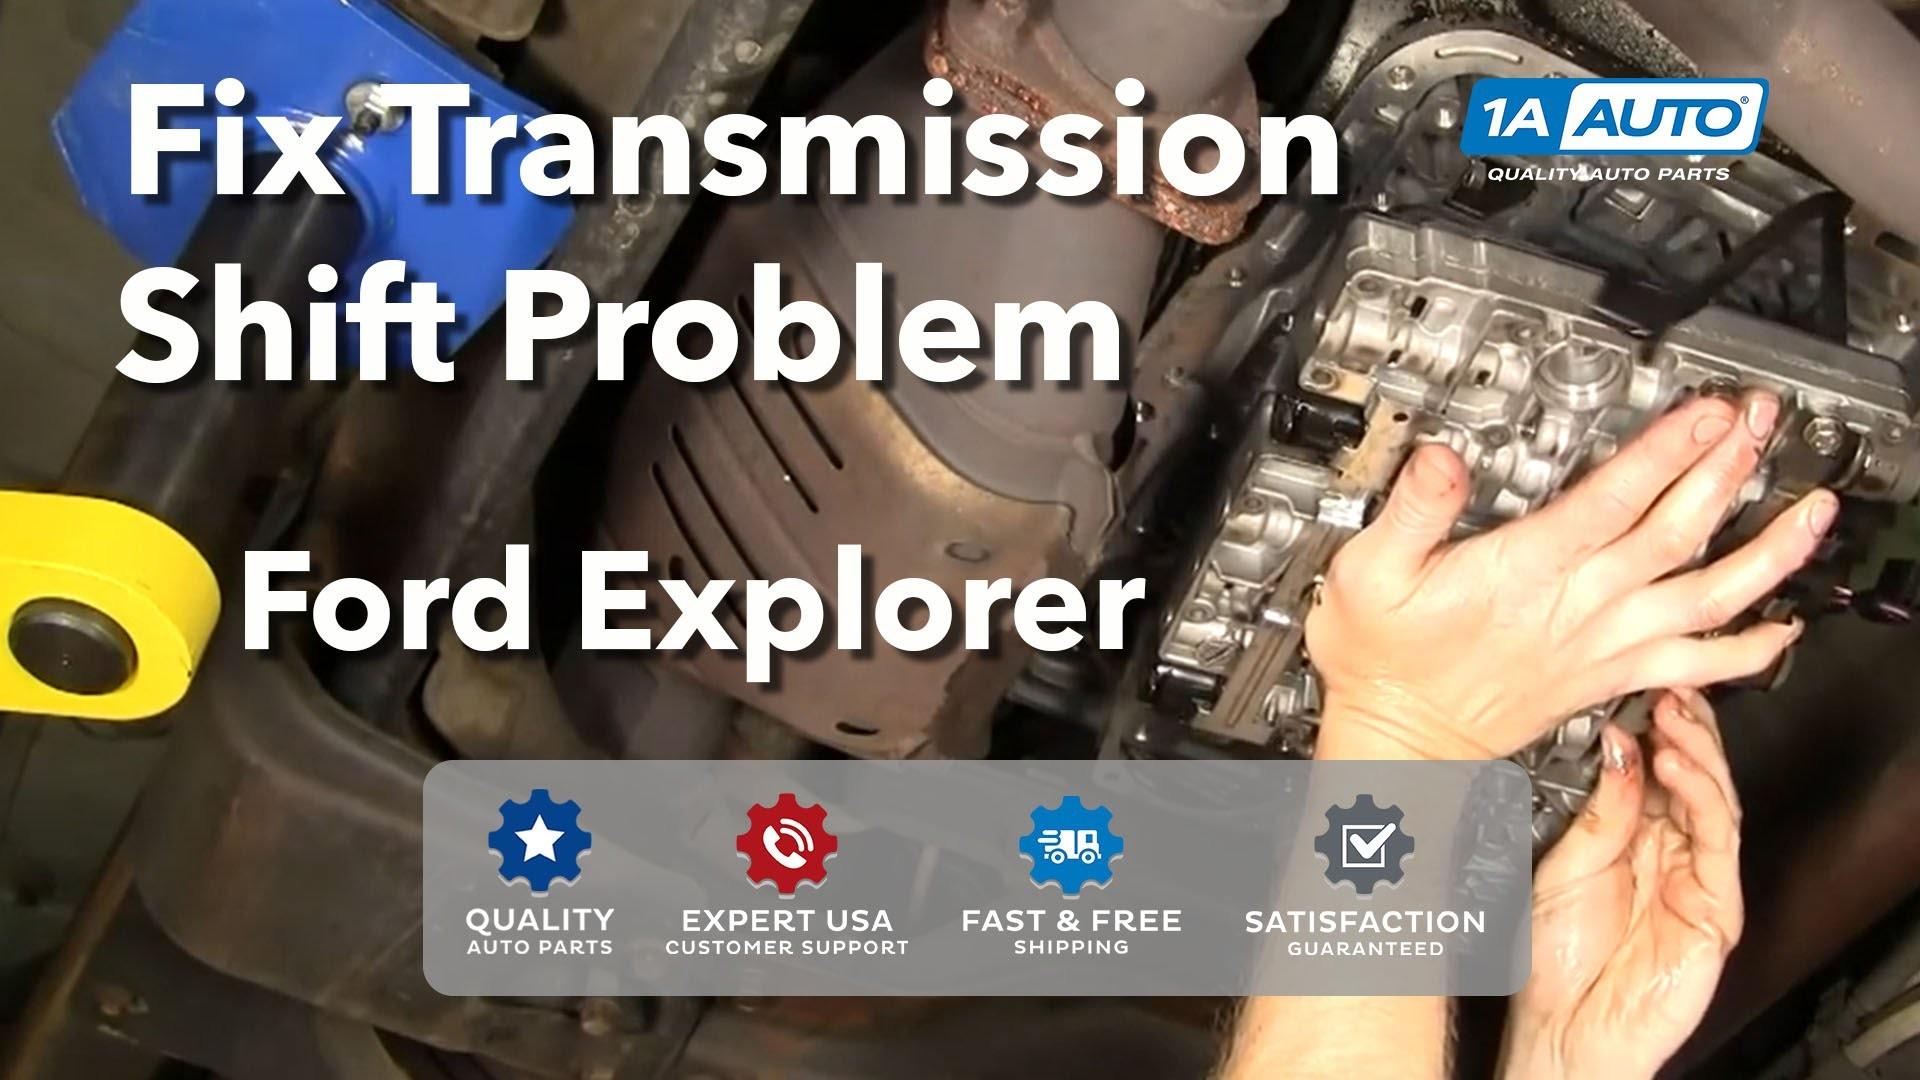 2000 ford Explorer Parts Diagram Auto Repair Fix Transmission Shift Problem ford 5r55e Explorer Buy Of 2000 ford Explorer Parts Diagram